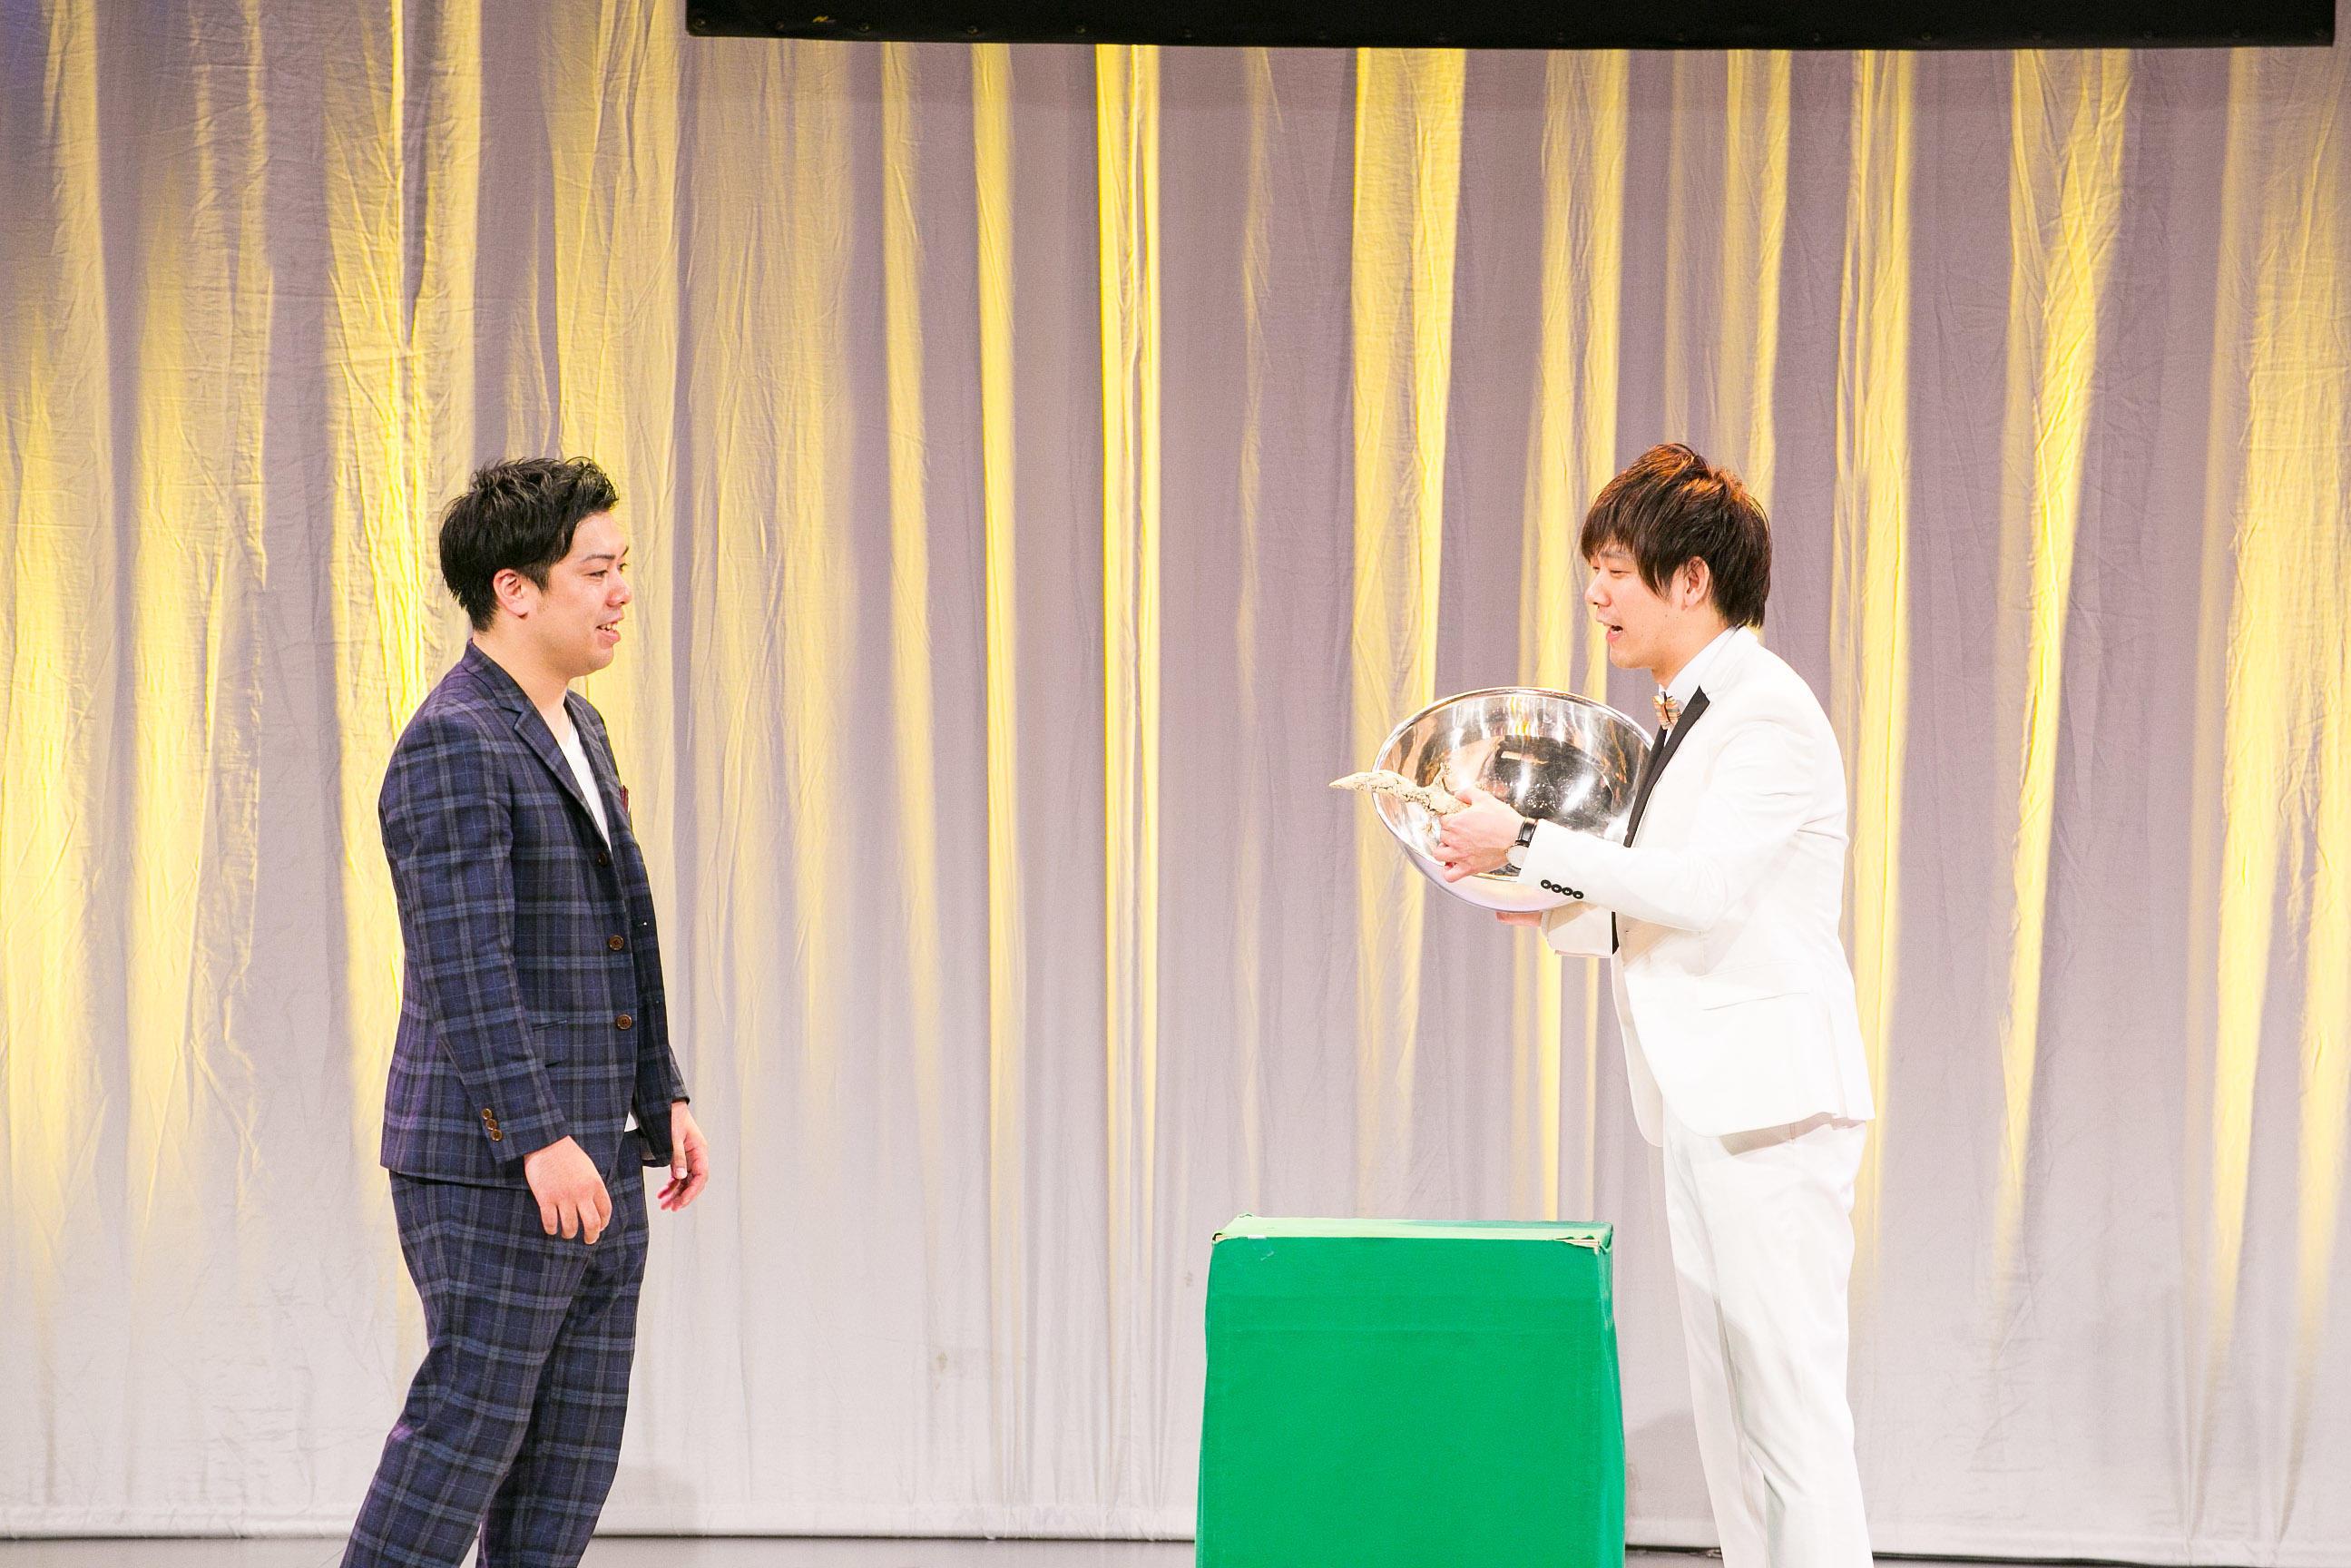 http://news.yoshimoto.co.jp/20180430214423-5b8ea42a4ccf9ecc99b6daba70fdd6dfac5cdfc1.jpg